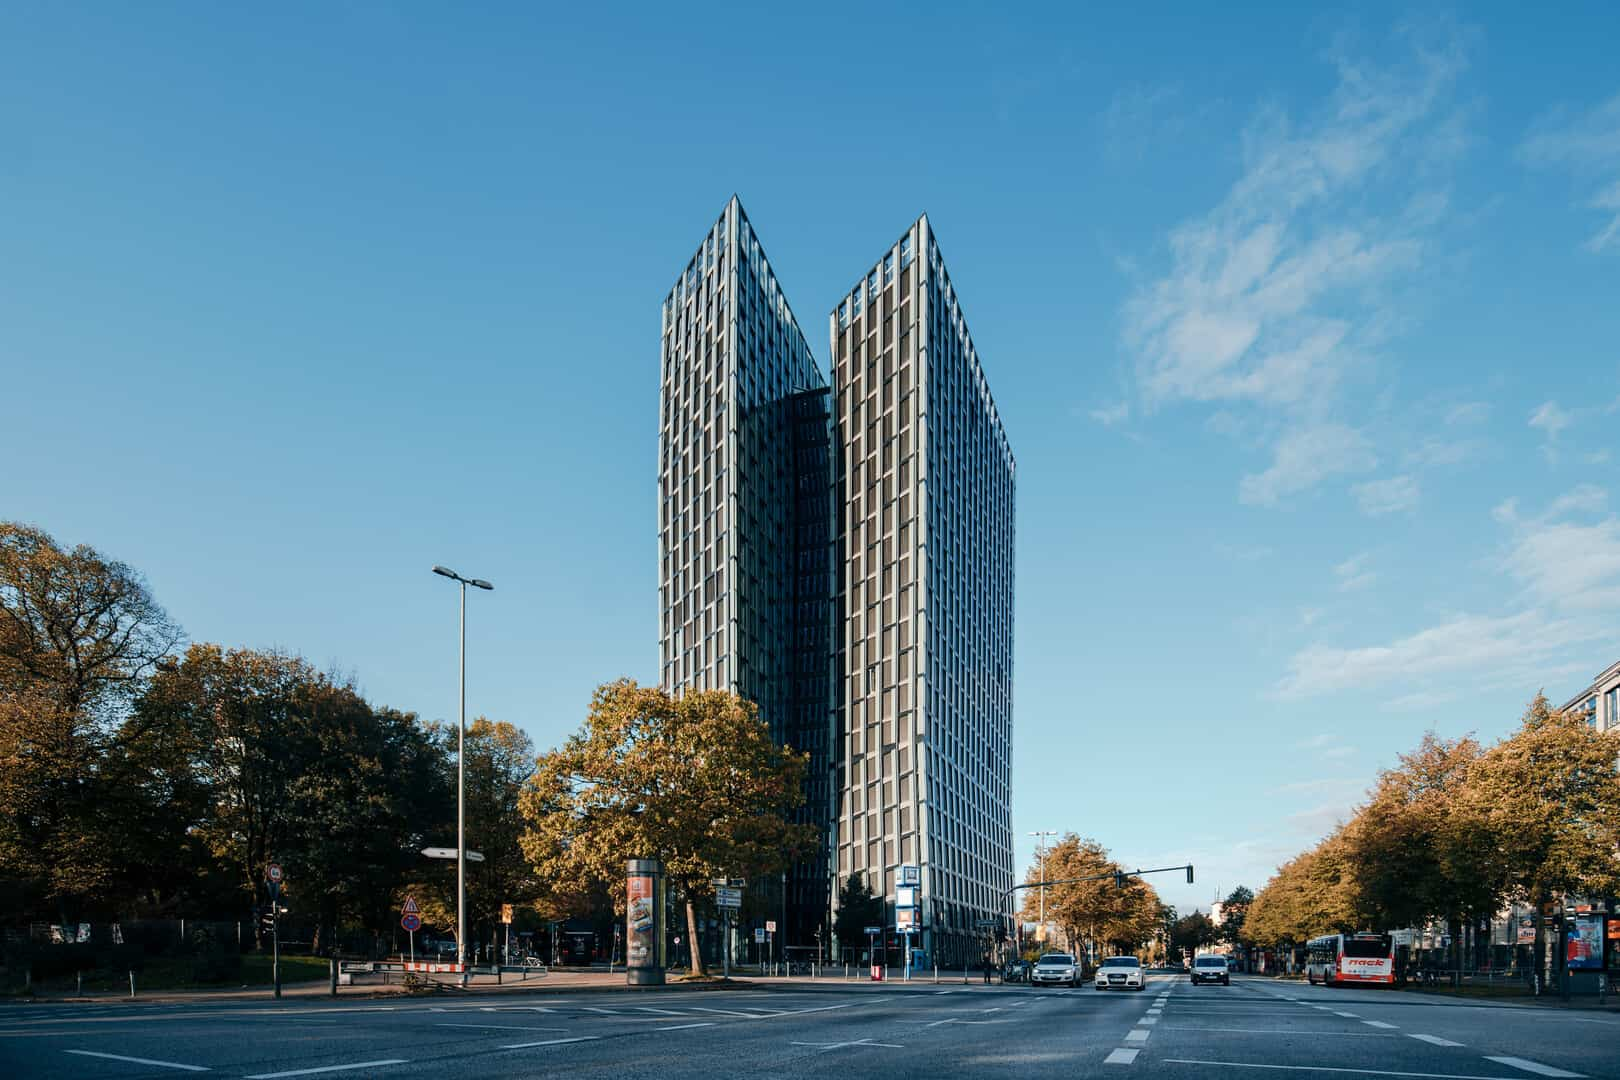 Die Tanzenden Türme - Foto: Mediaserver Hamburg - Konstantin Beck